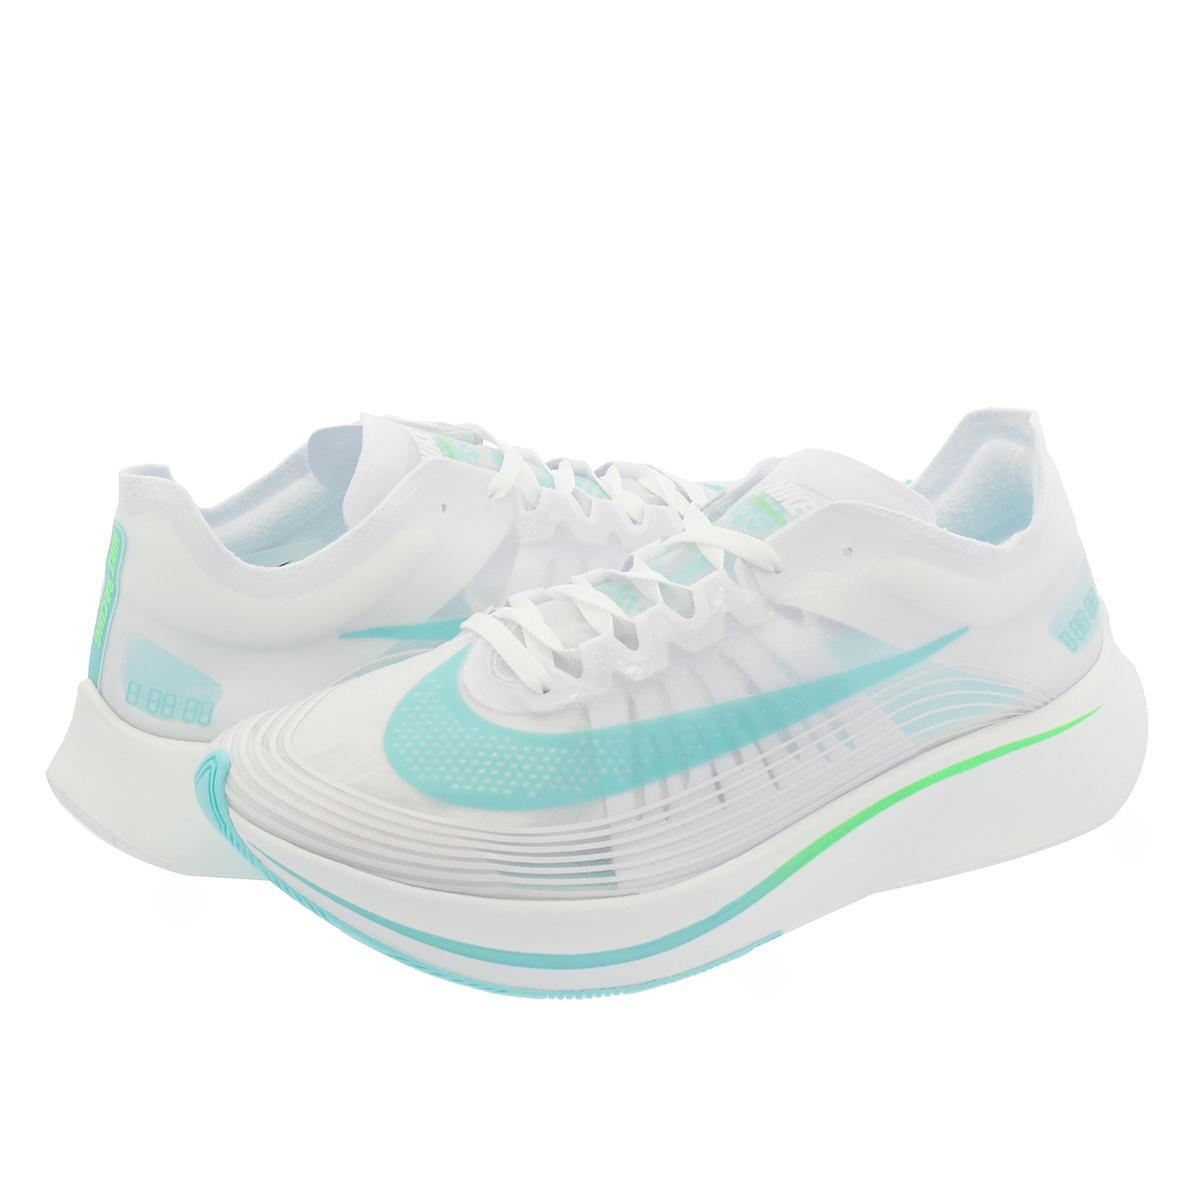 newest 7e950 e0eb9 NIKE ZOOM FLY SP Nike zoom fly SP WHITERAGE GREENSUMMIT WHITE aj9282-103